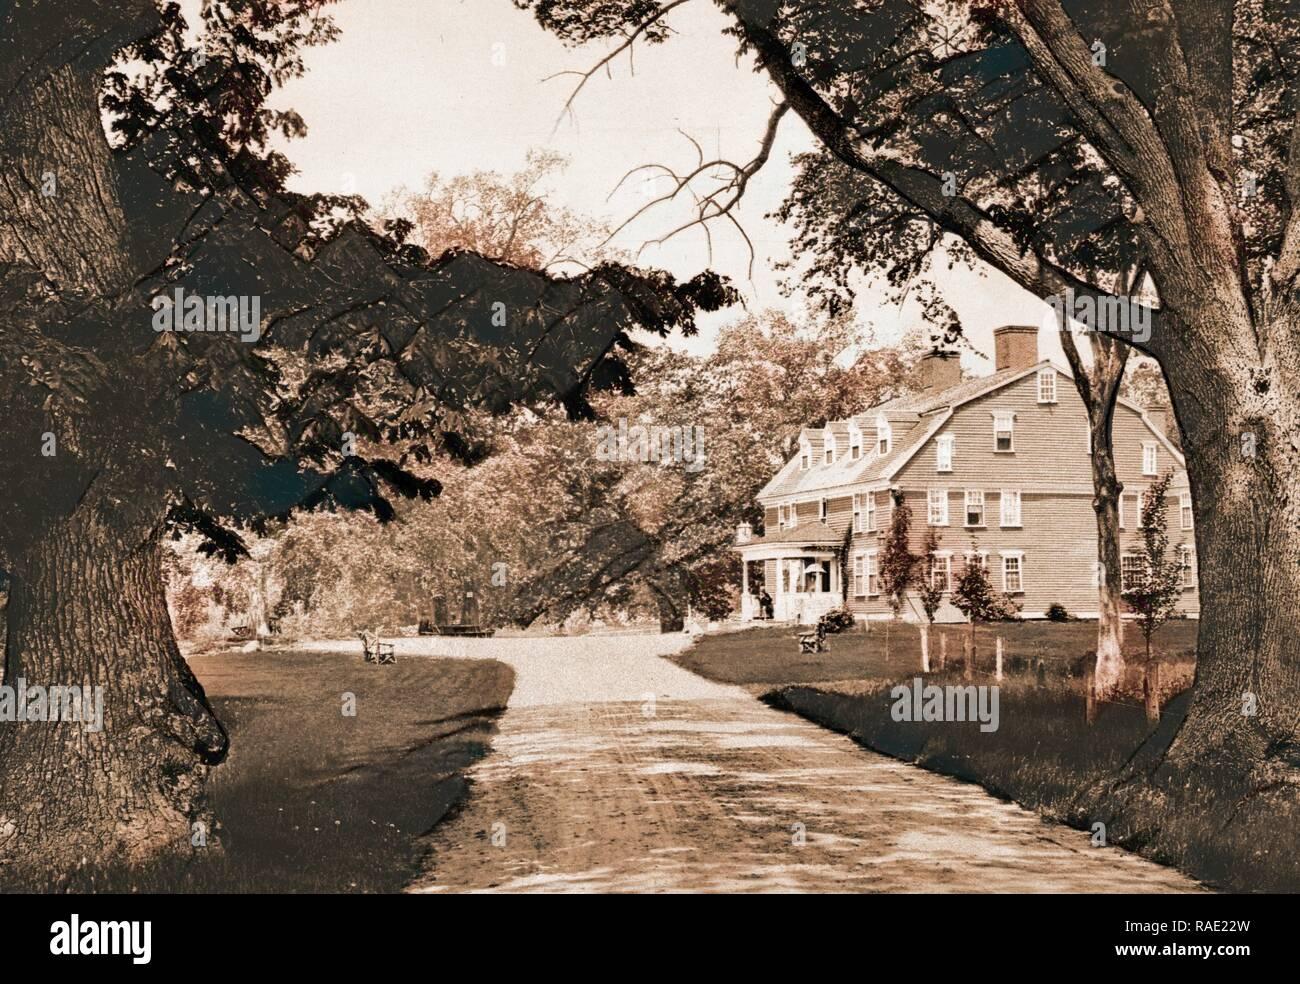 The Wayside Inn, Sudbury, Massachusetts, taverns (inns), United States, Massachusetts, Sudbury, 190. Reimagined - Stock Image